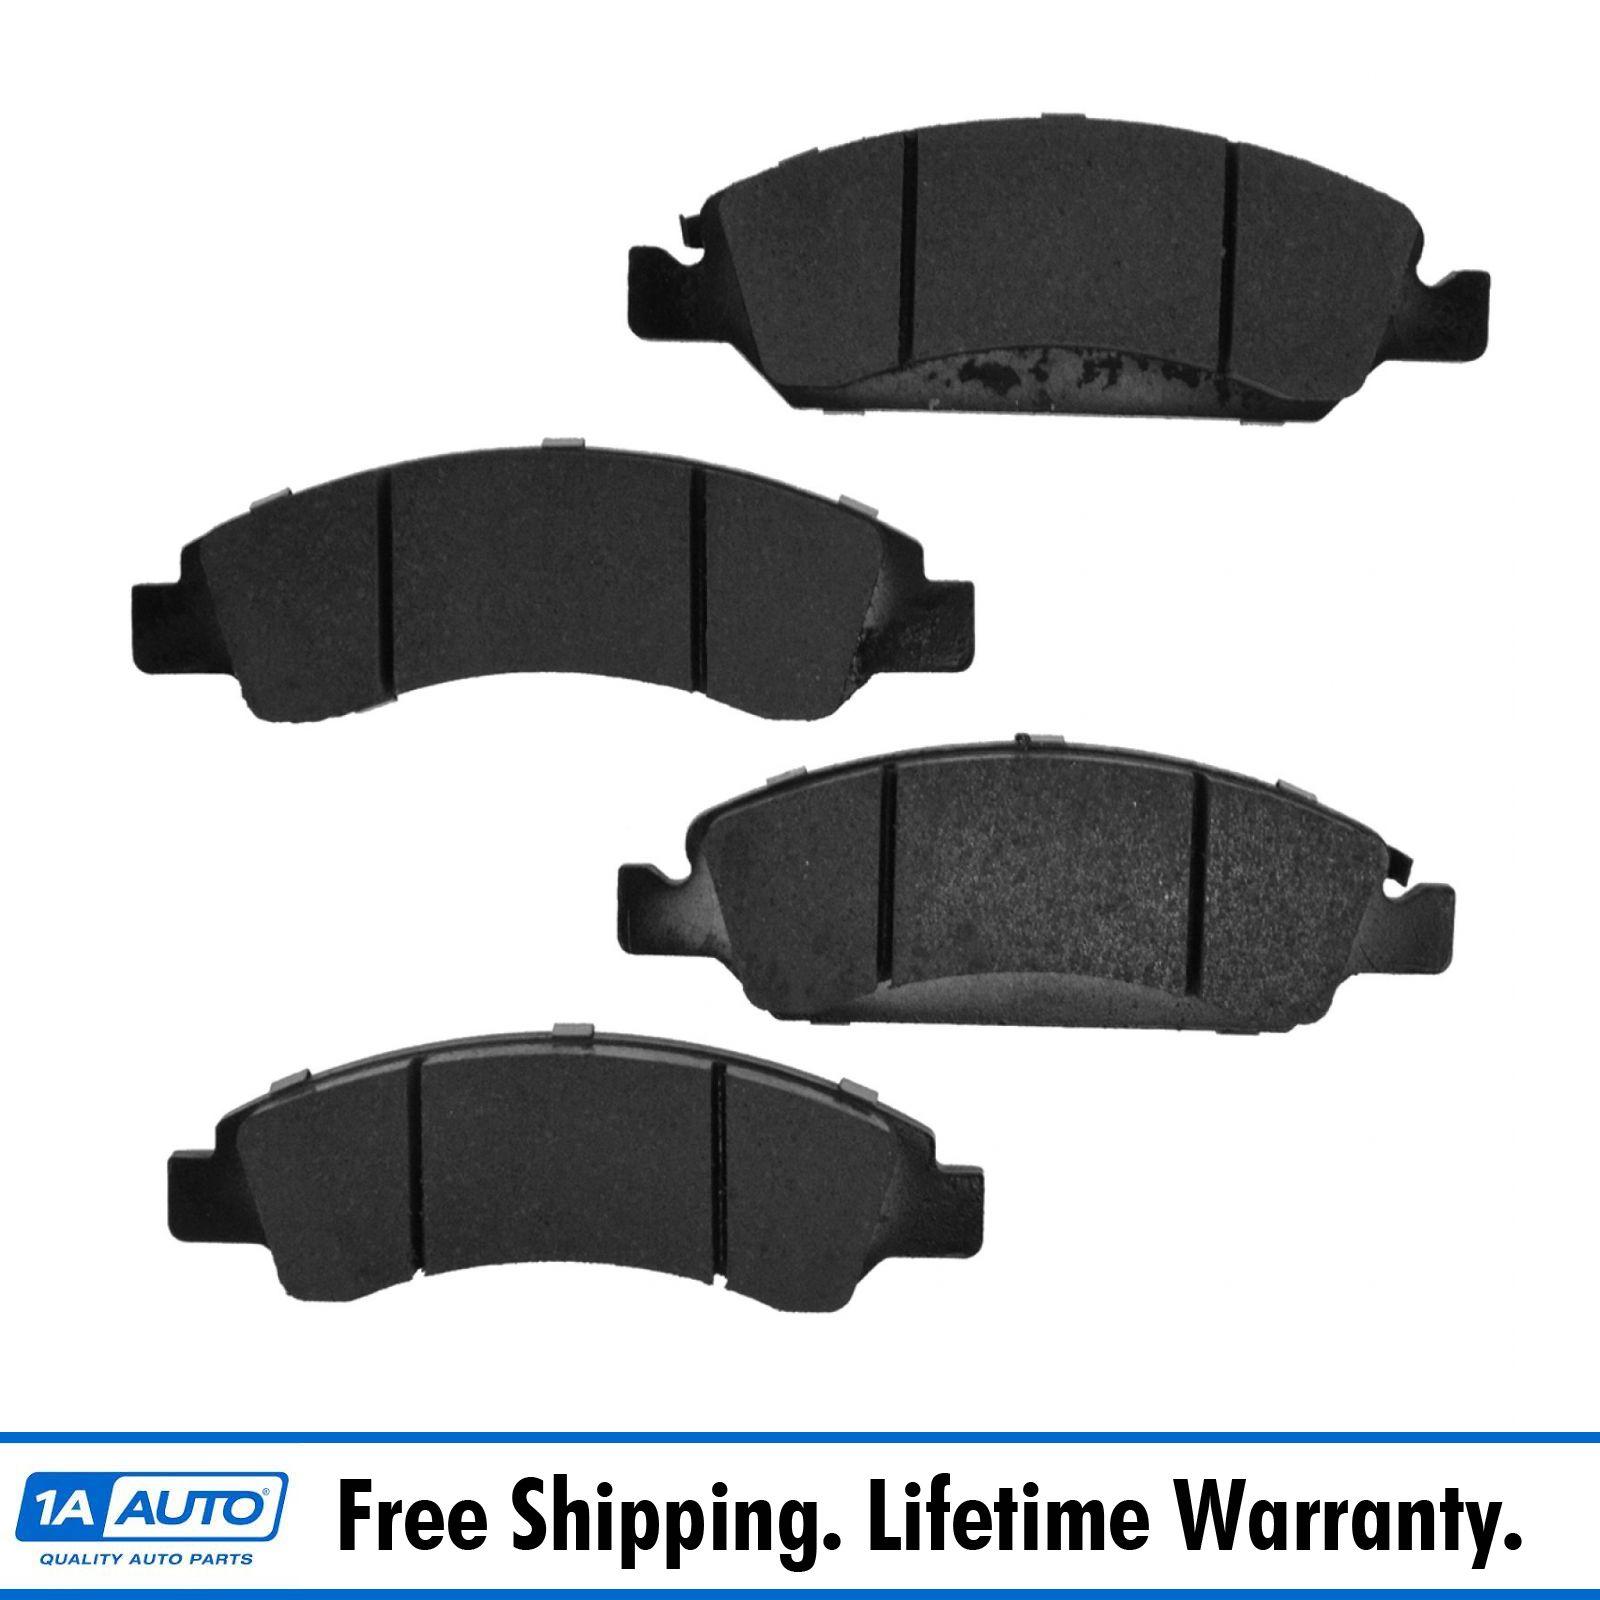 Disc Brake Pads Set Kit Ceramic Rear for Cadillac Chevy GMC SUV Van NEW